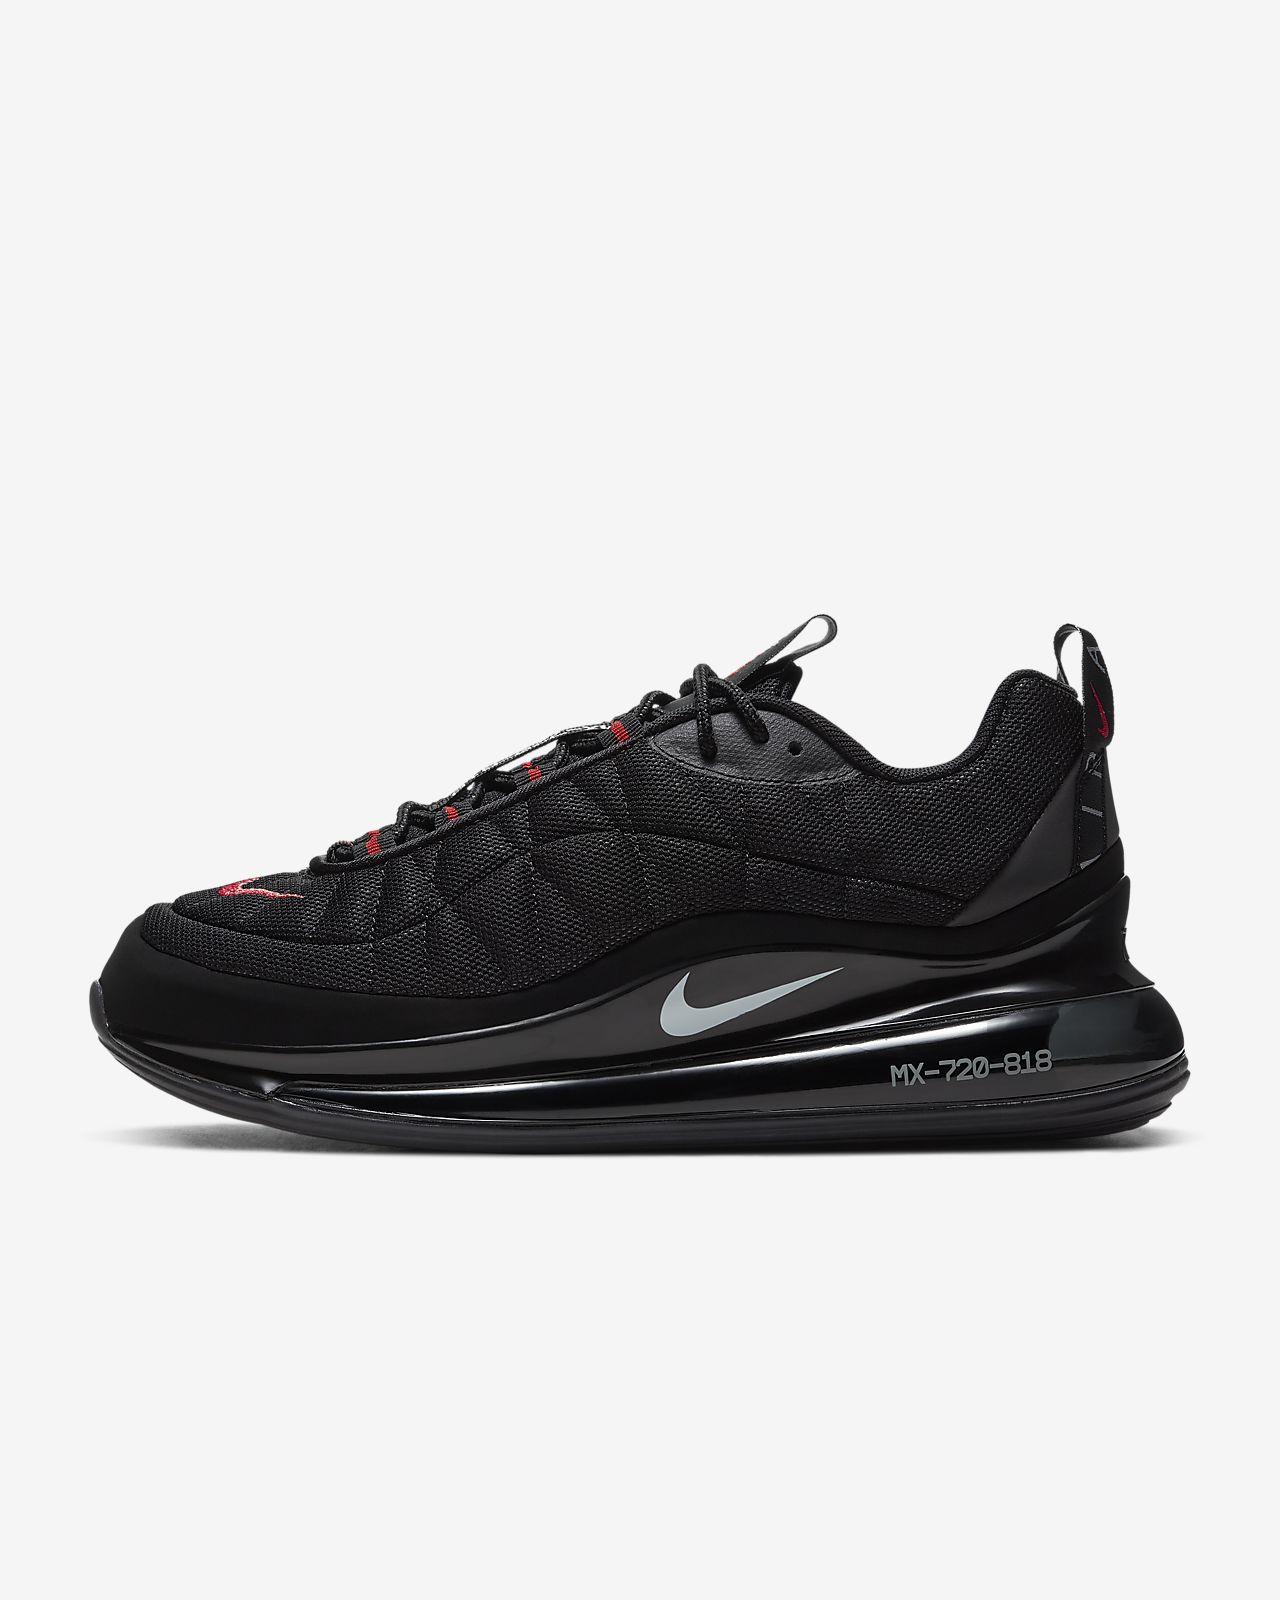 Nike MX 720 818 Zapatillas Hombre